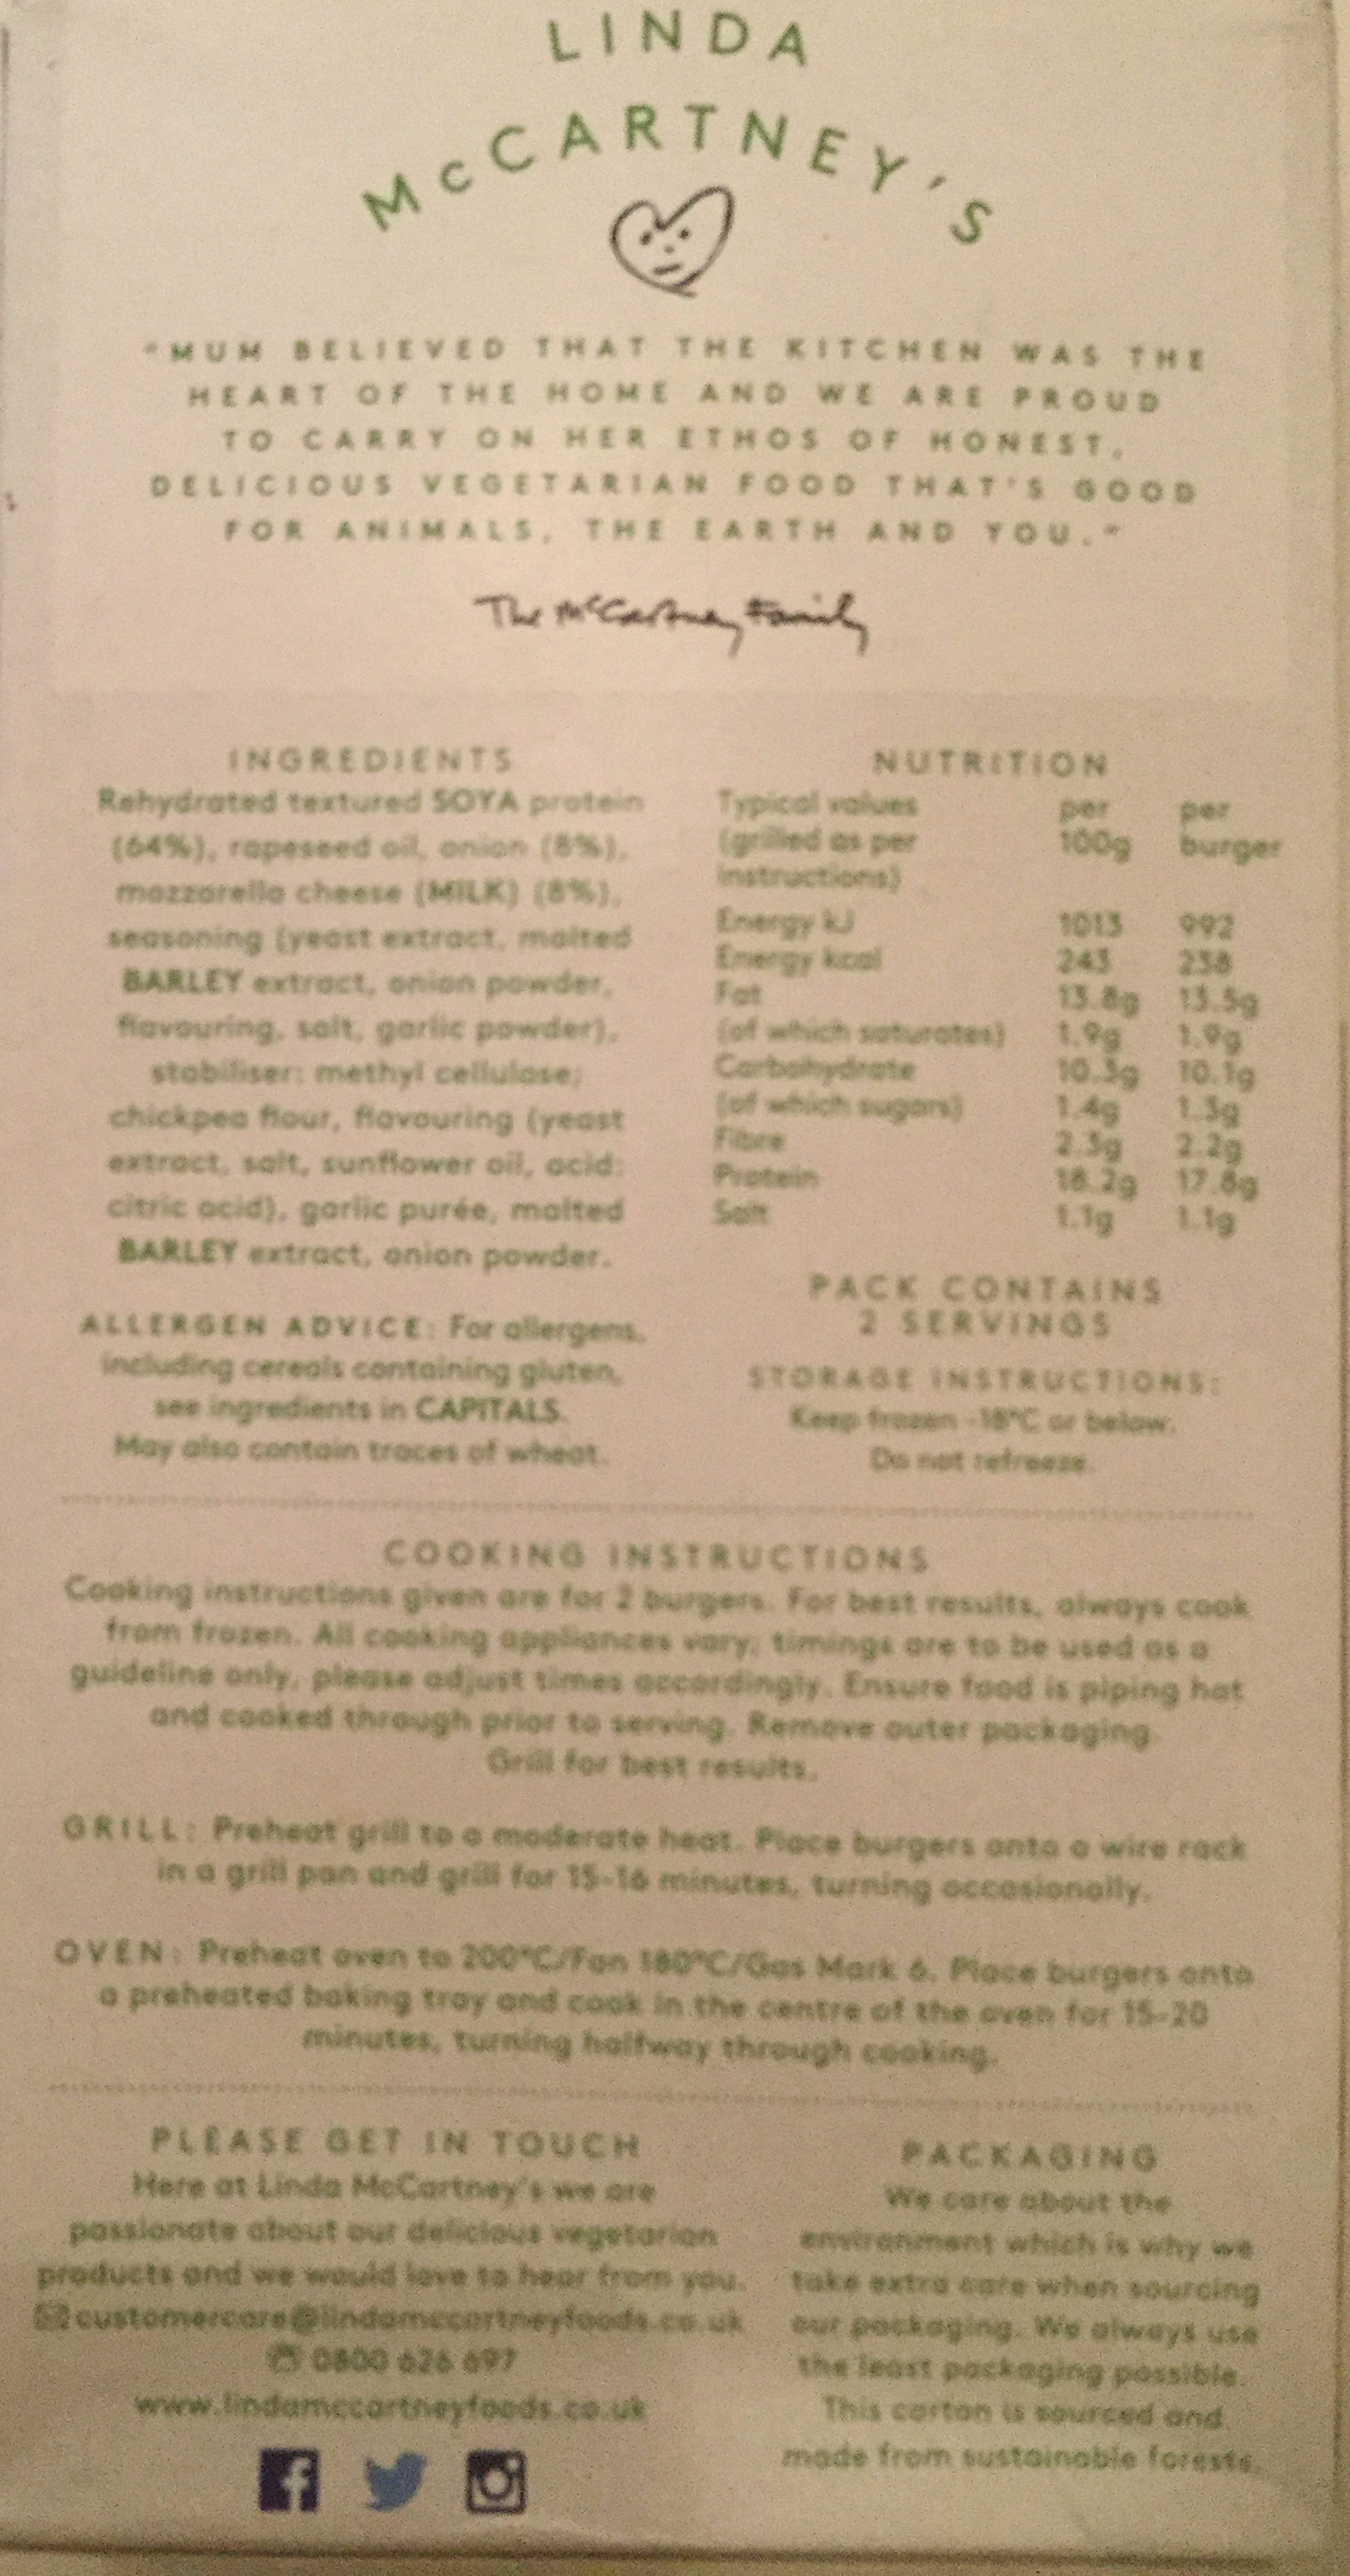 Linda Mccartney's 2 Vegetarian mozzarella 1/4 lb burgers - Nutrition facts - en